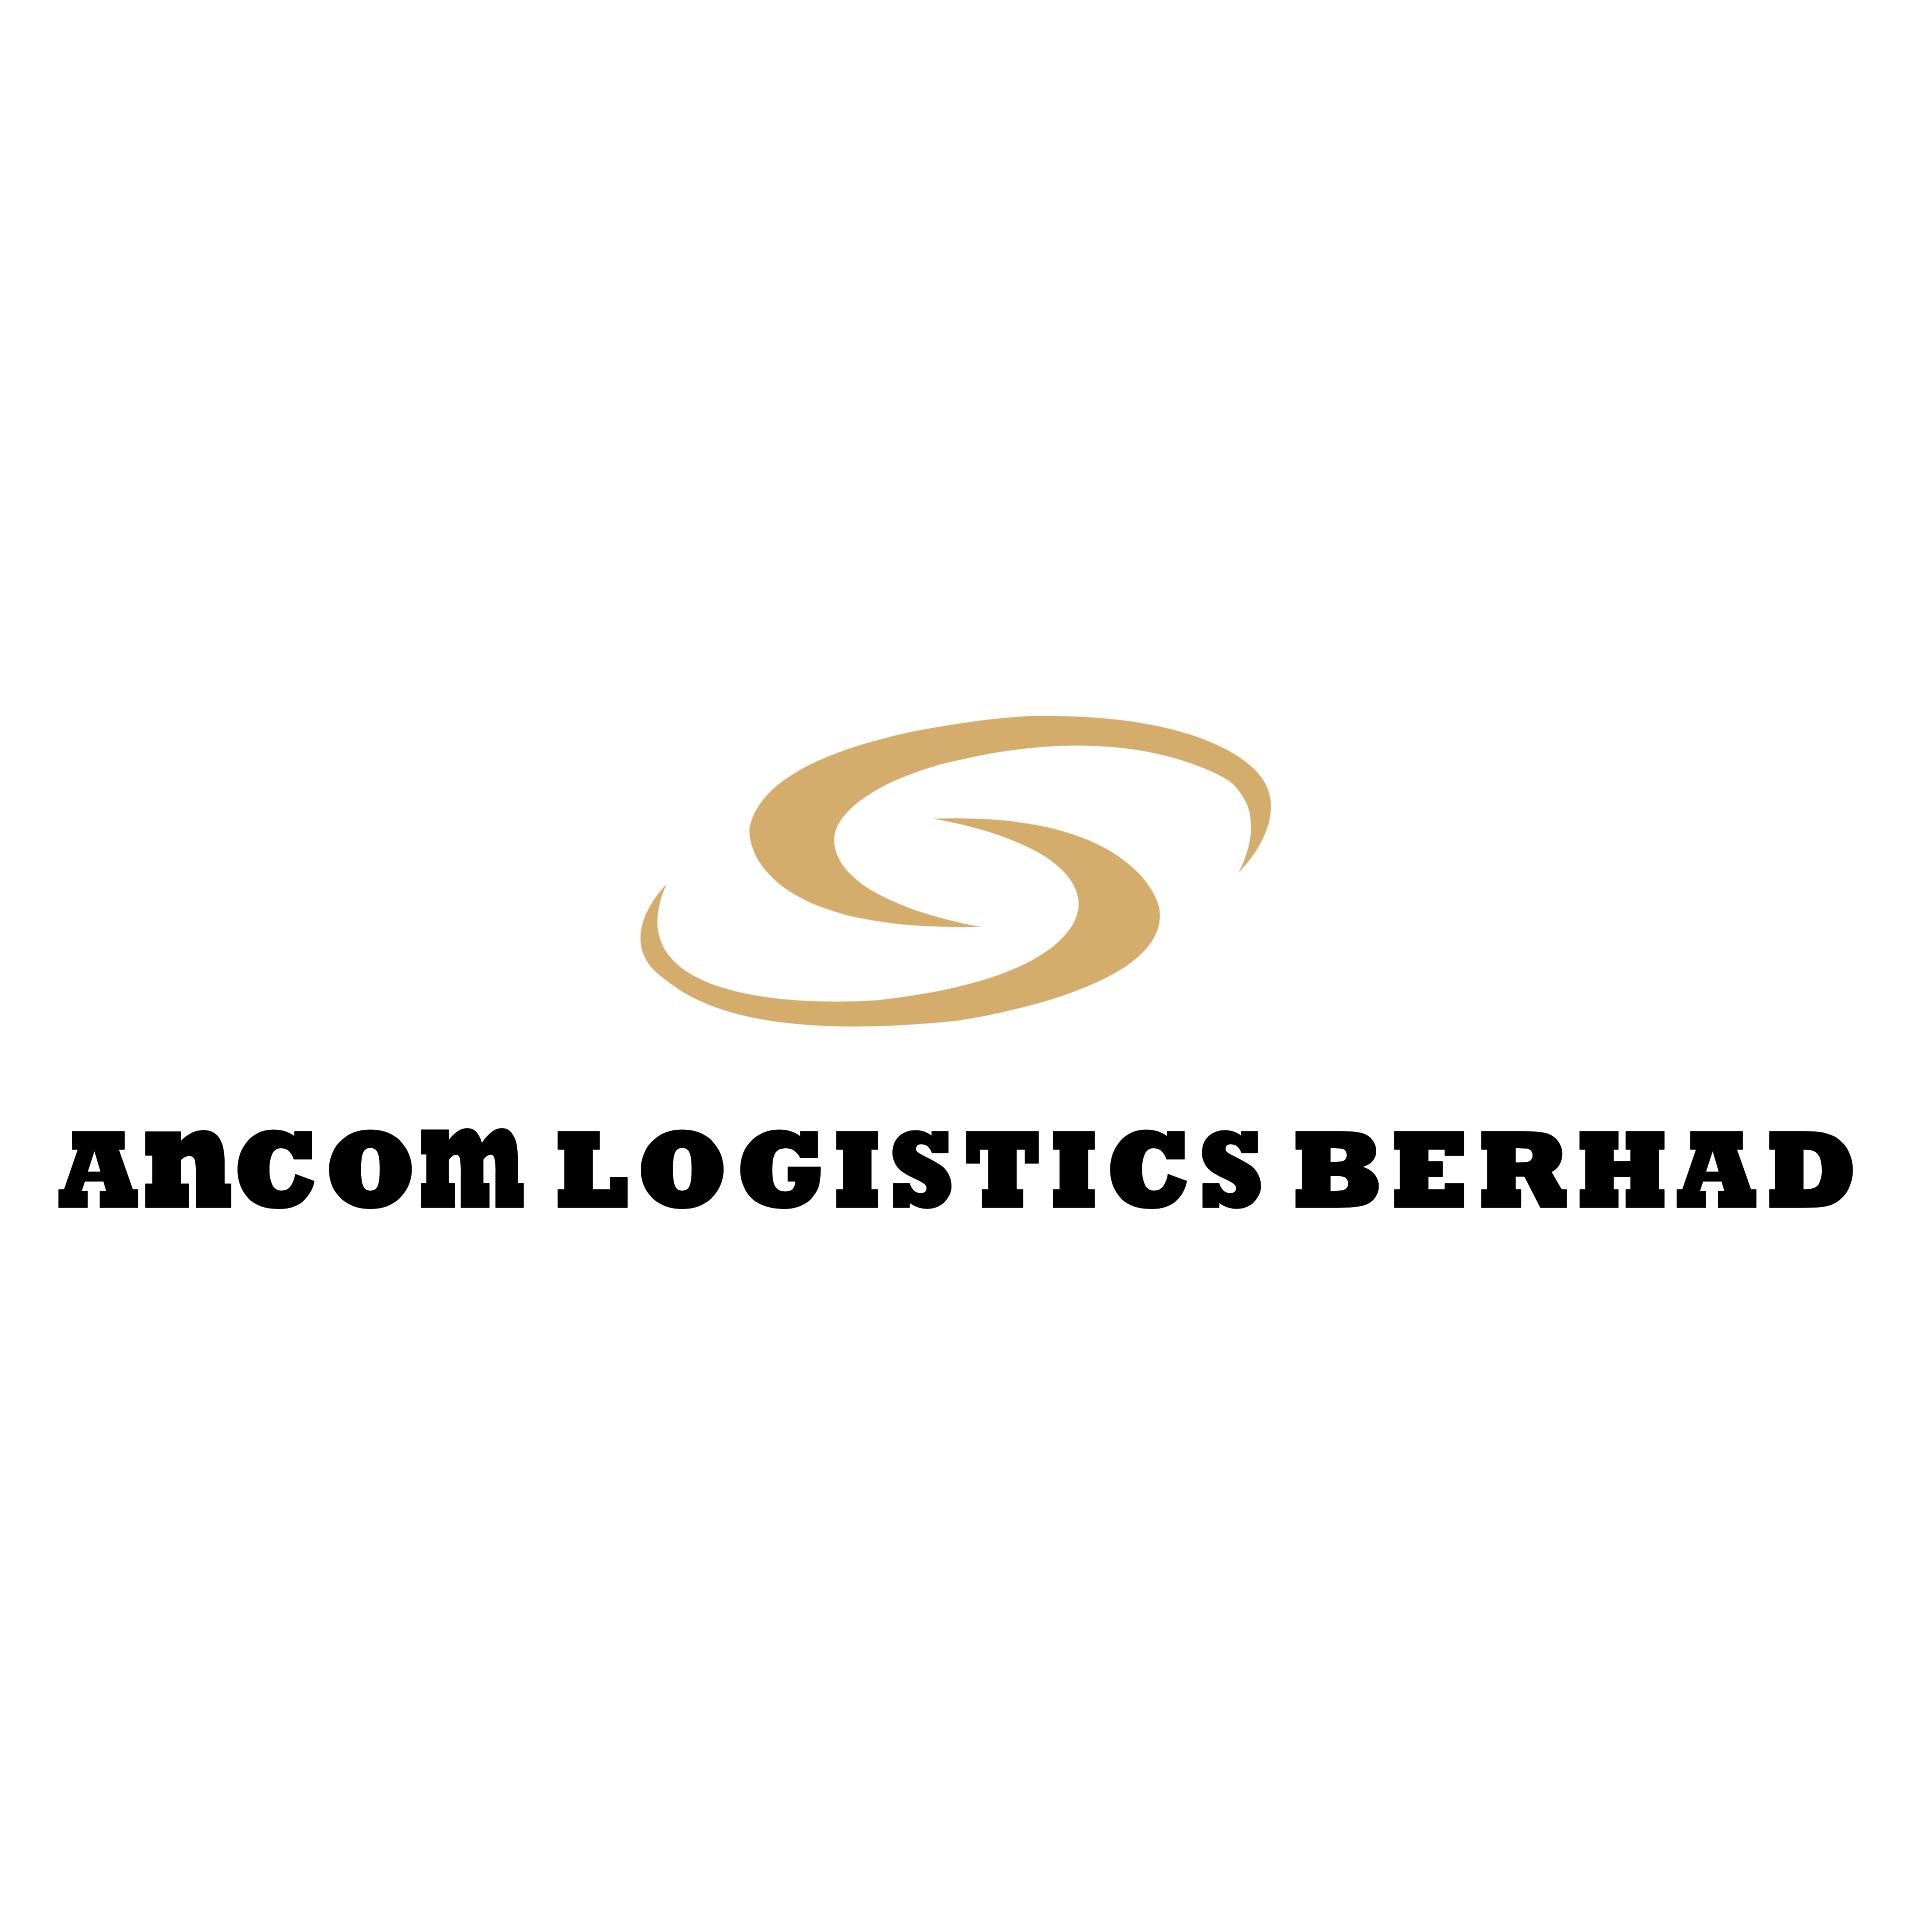 ANCOMLB | ANCOM LOGISTICS BERHAD